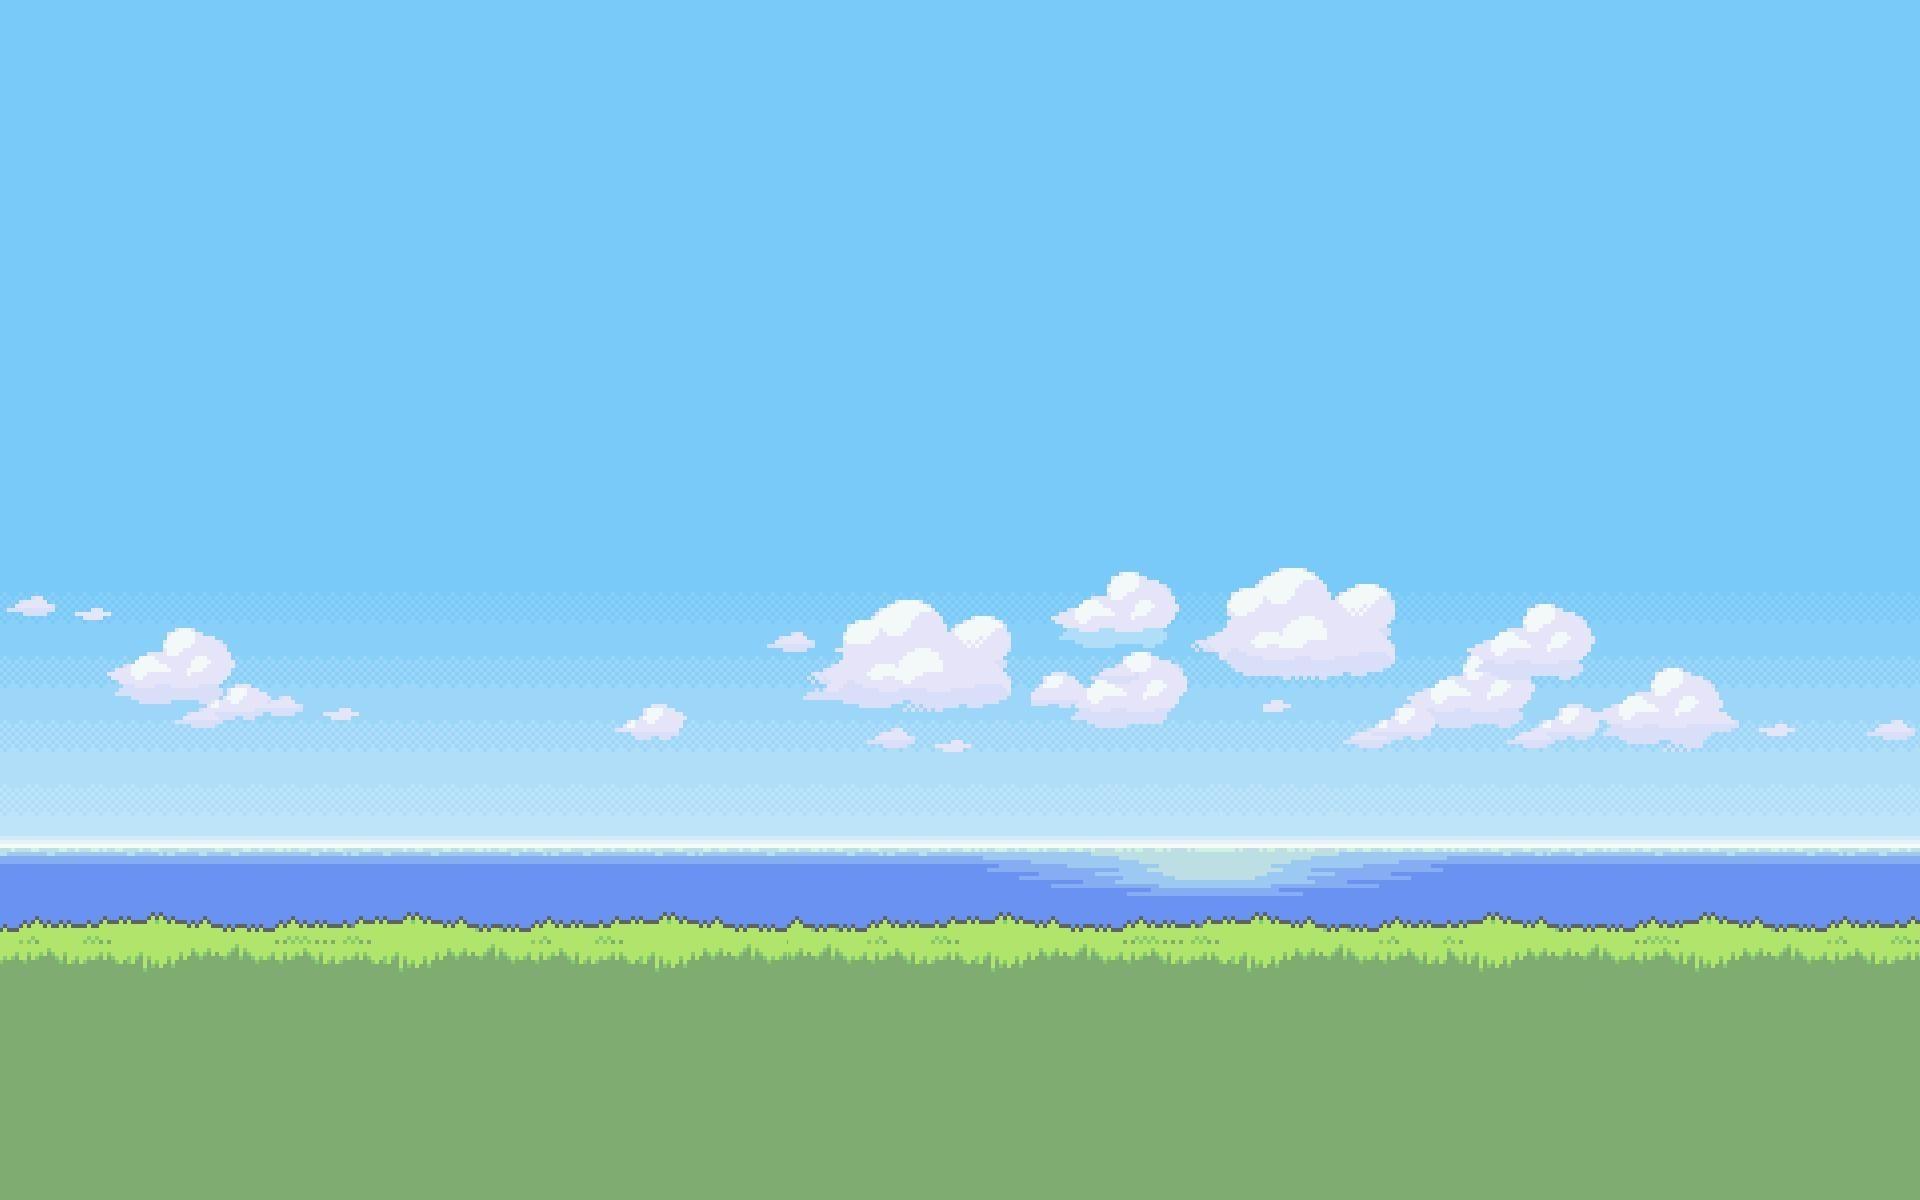 high resolution wallpapers widescreen pokemon ruby version – pokemon ruby  version category